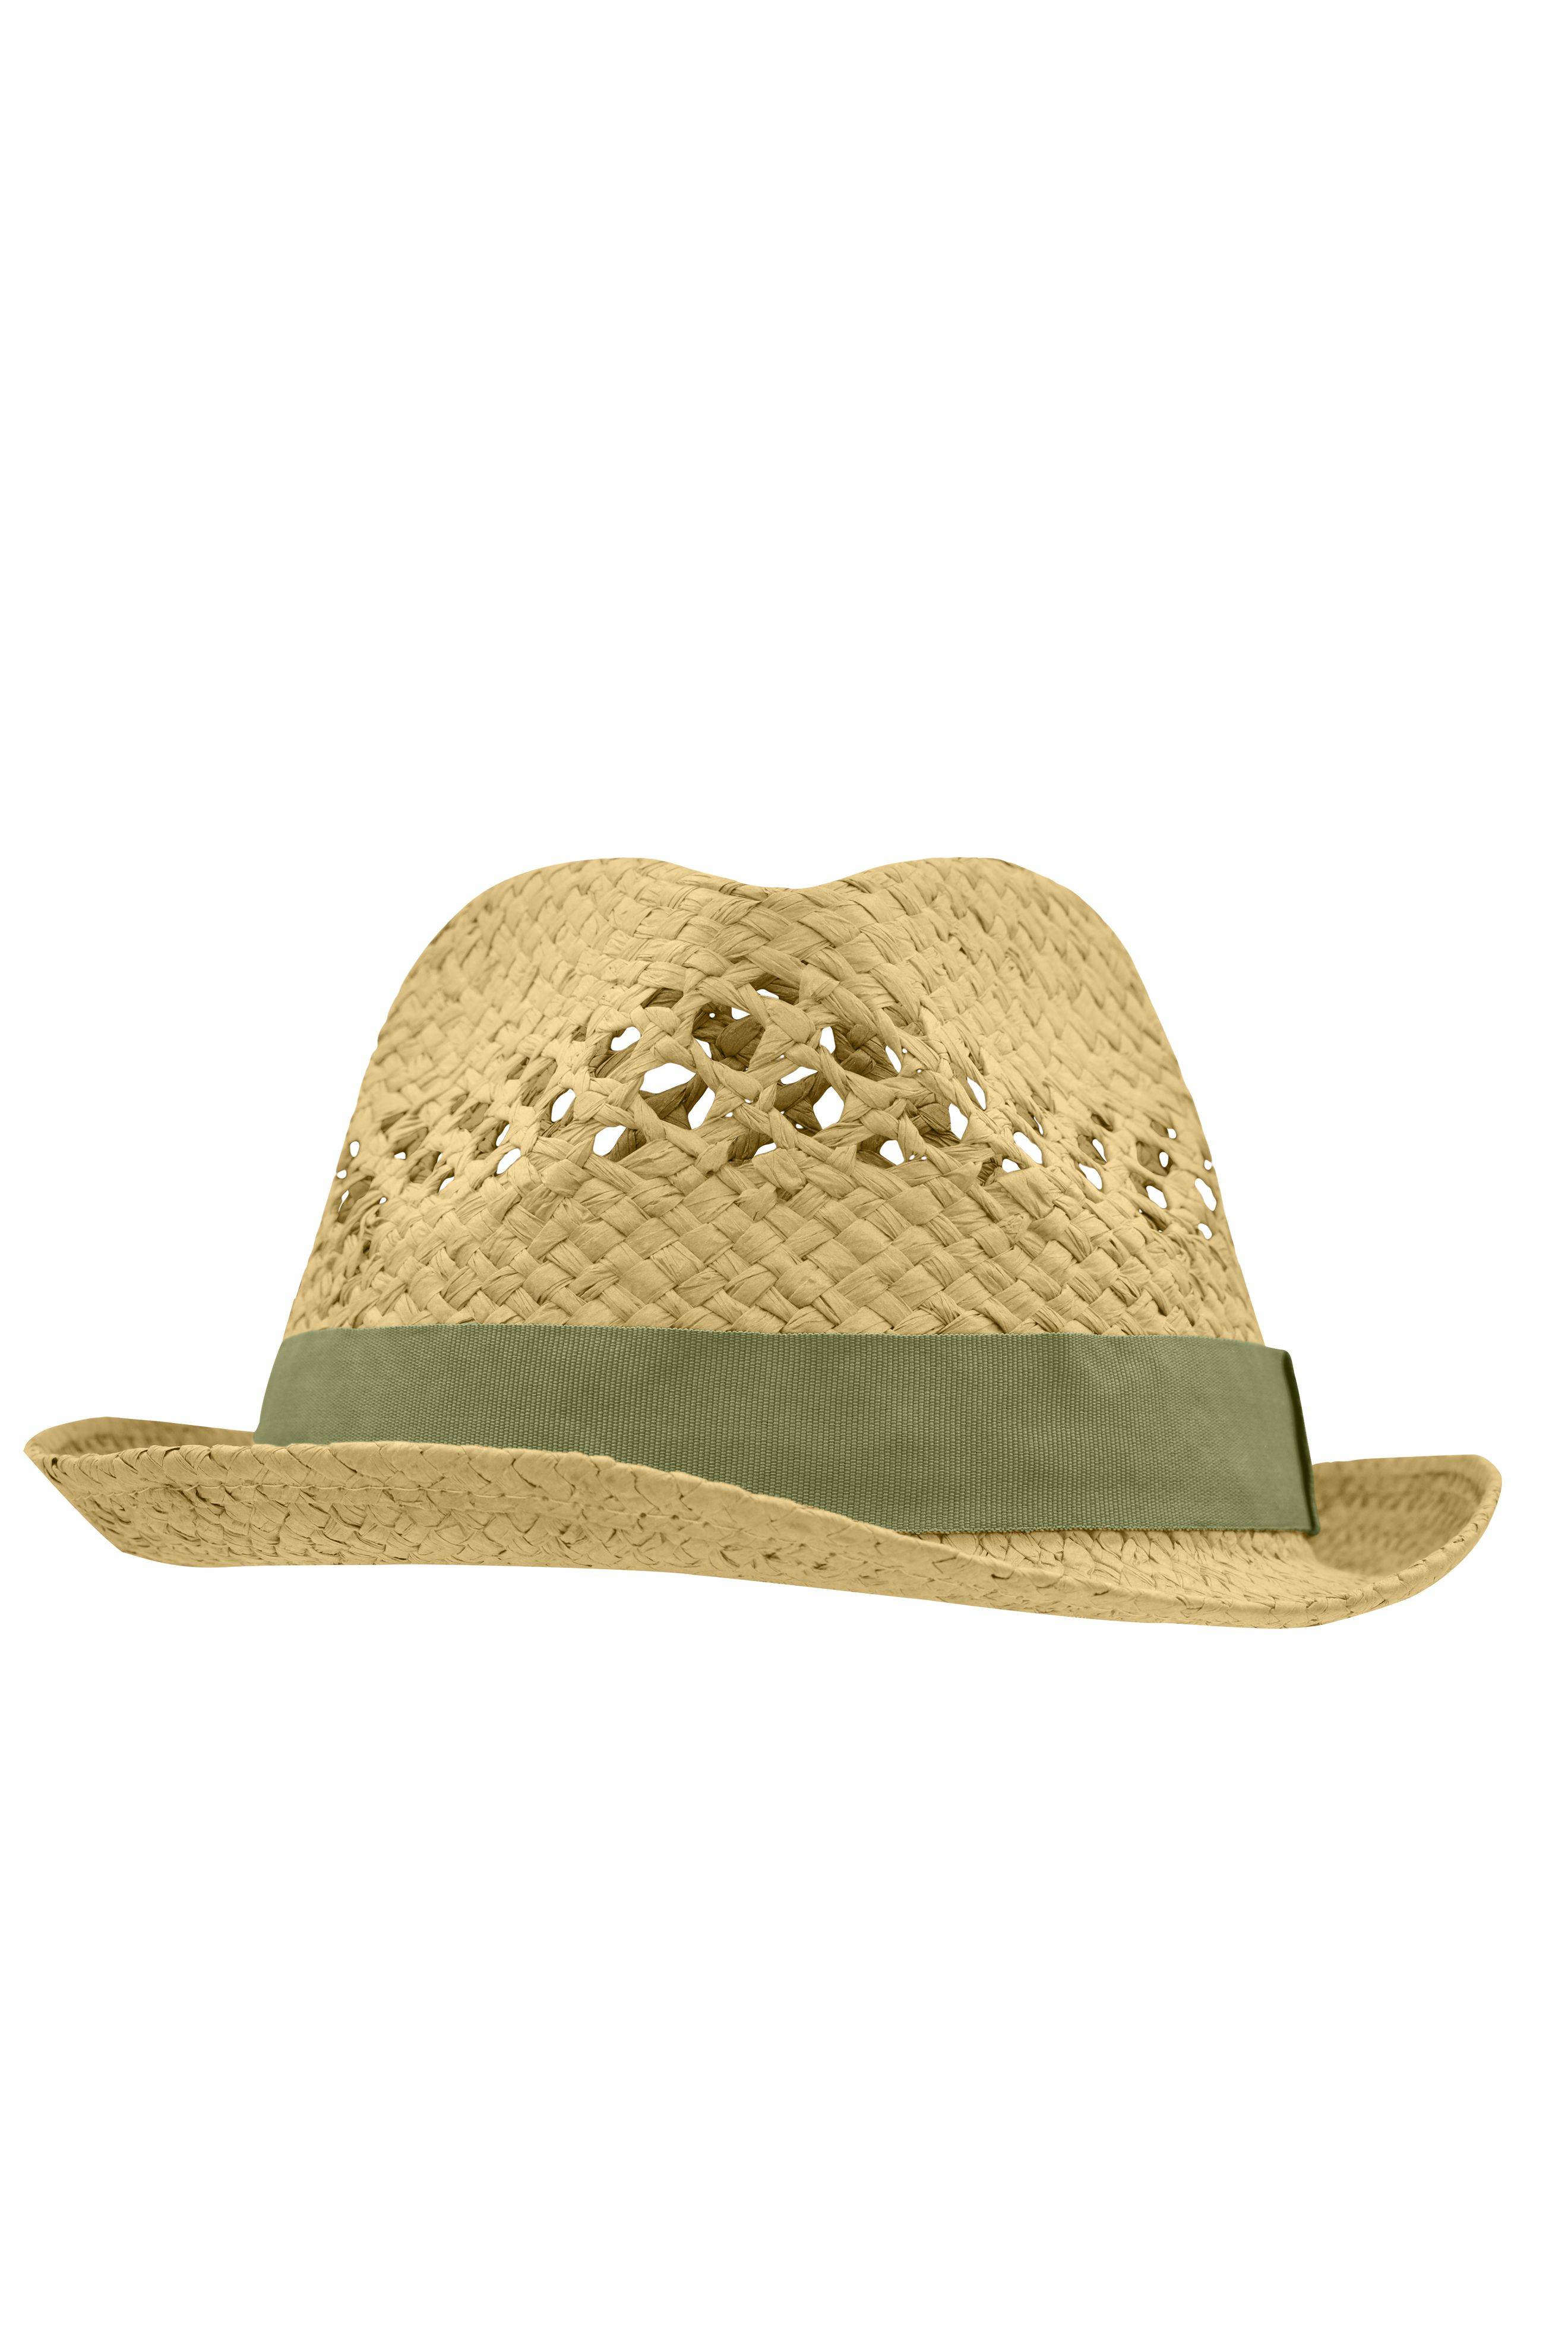 Trendstarker Hut in aufwendiger Flechtoptik